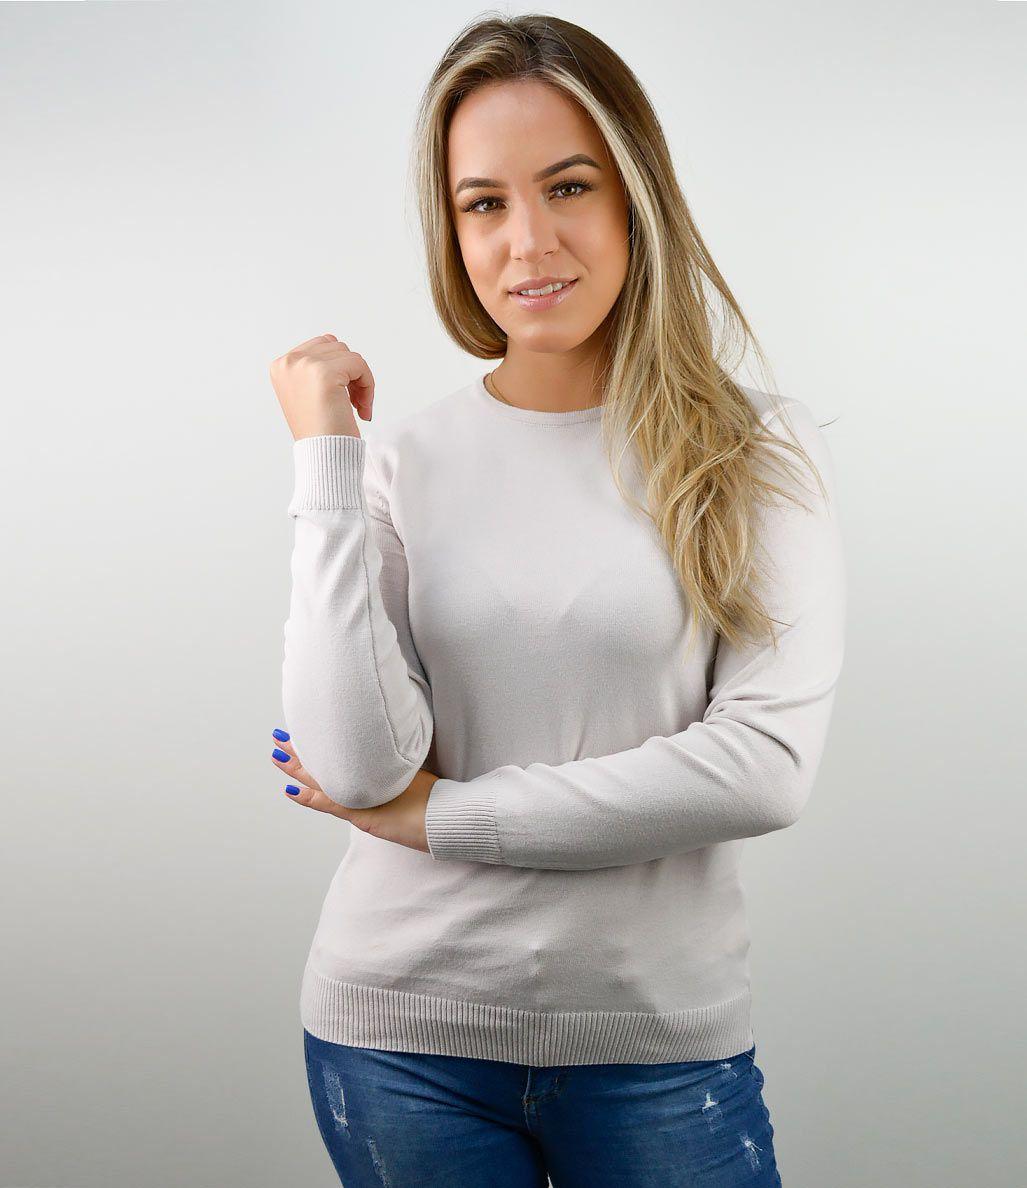 BLUSA ELLIS BÁSICA DECOTE REDONDO 100% ALGODÃO CINZA CLARO